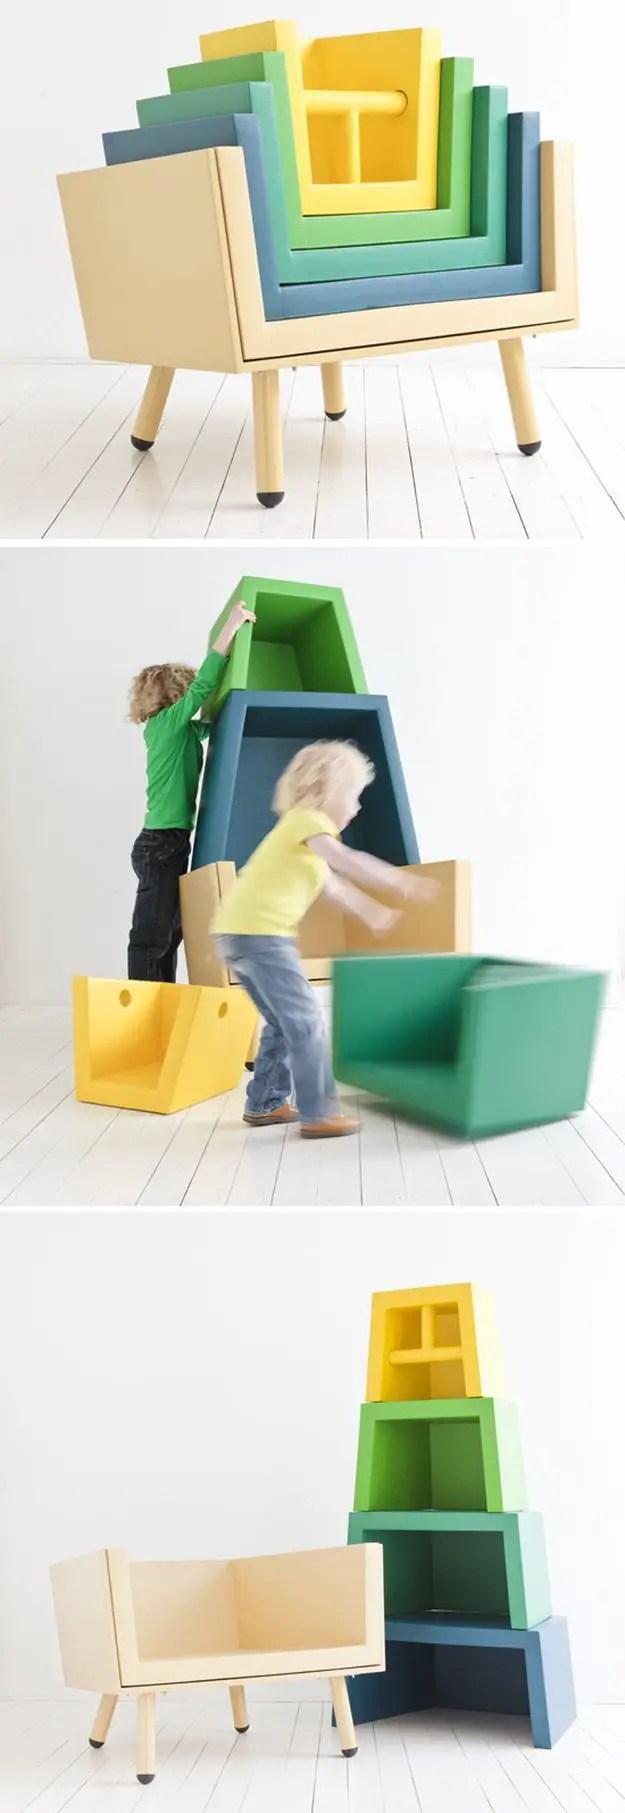 Mobila inteligenta pentru copii acasa